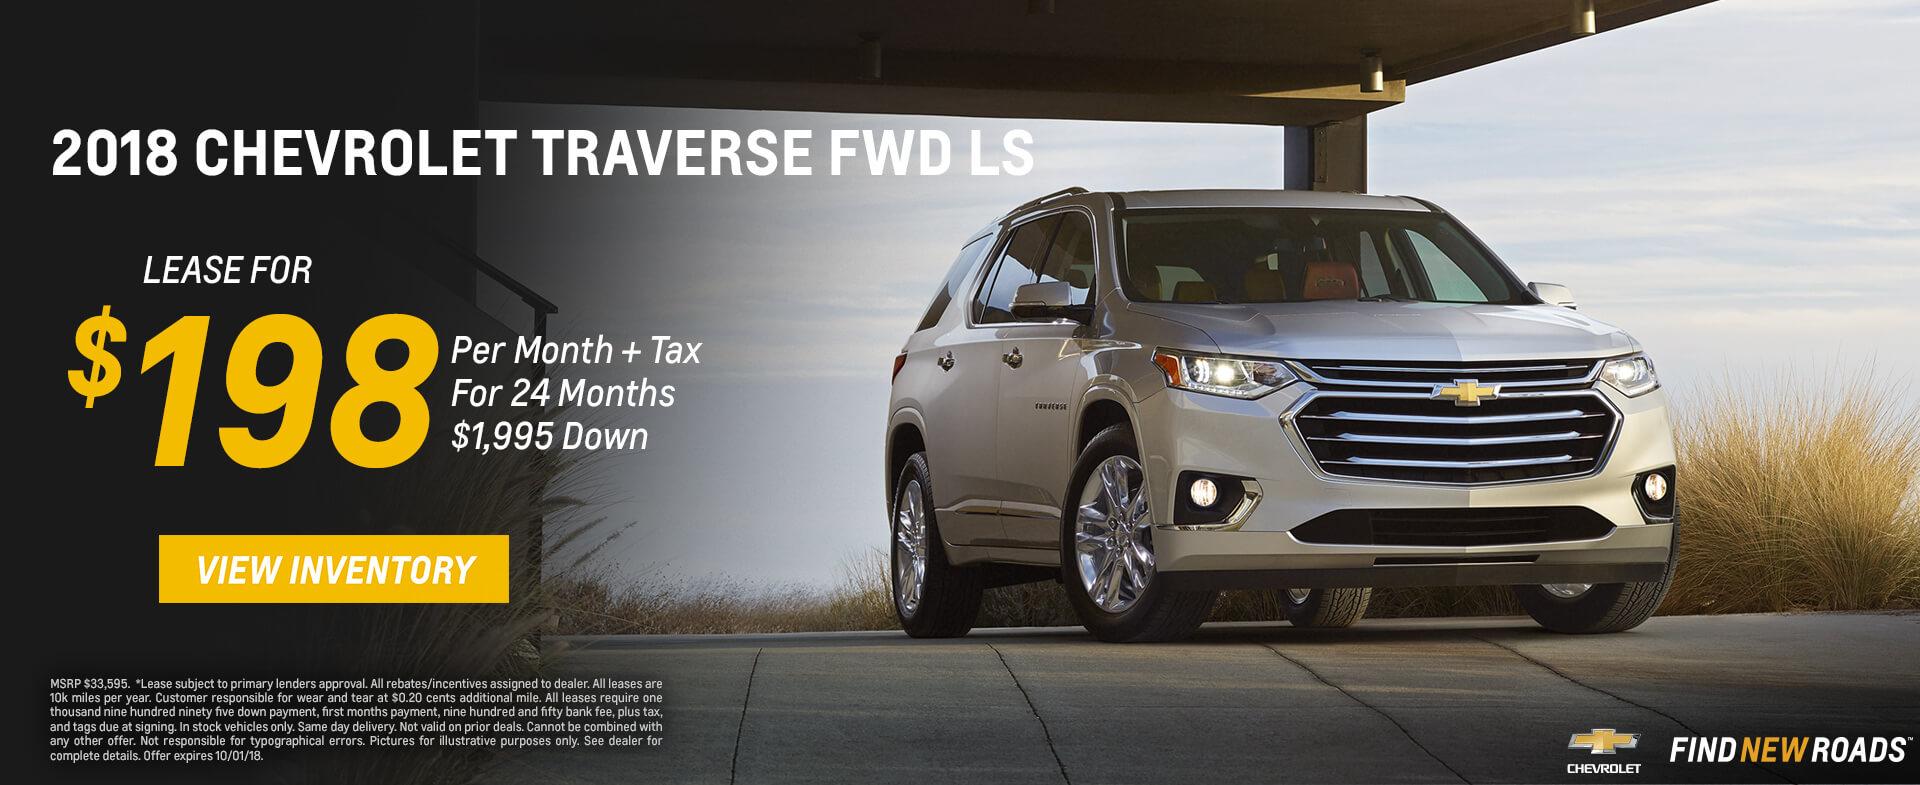 Chevrolet Traverse $198 Lease